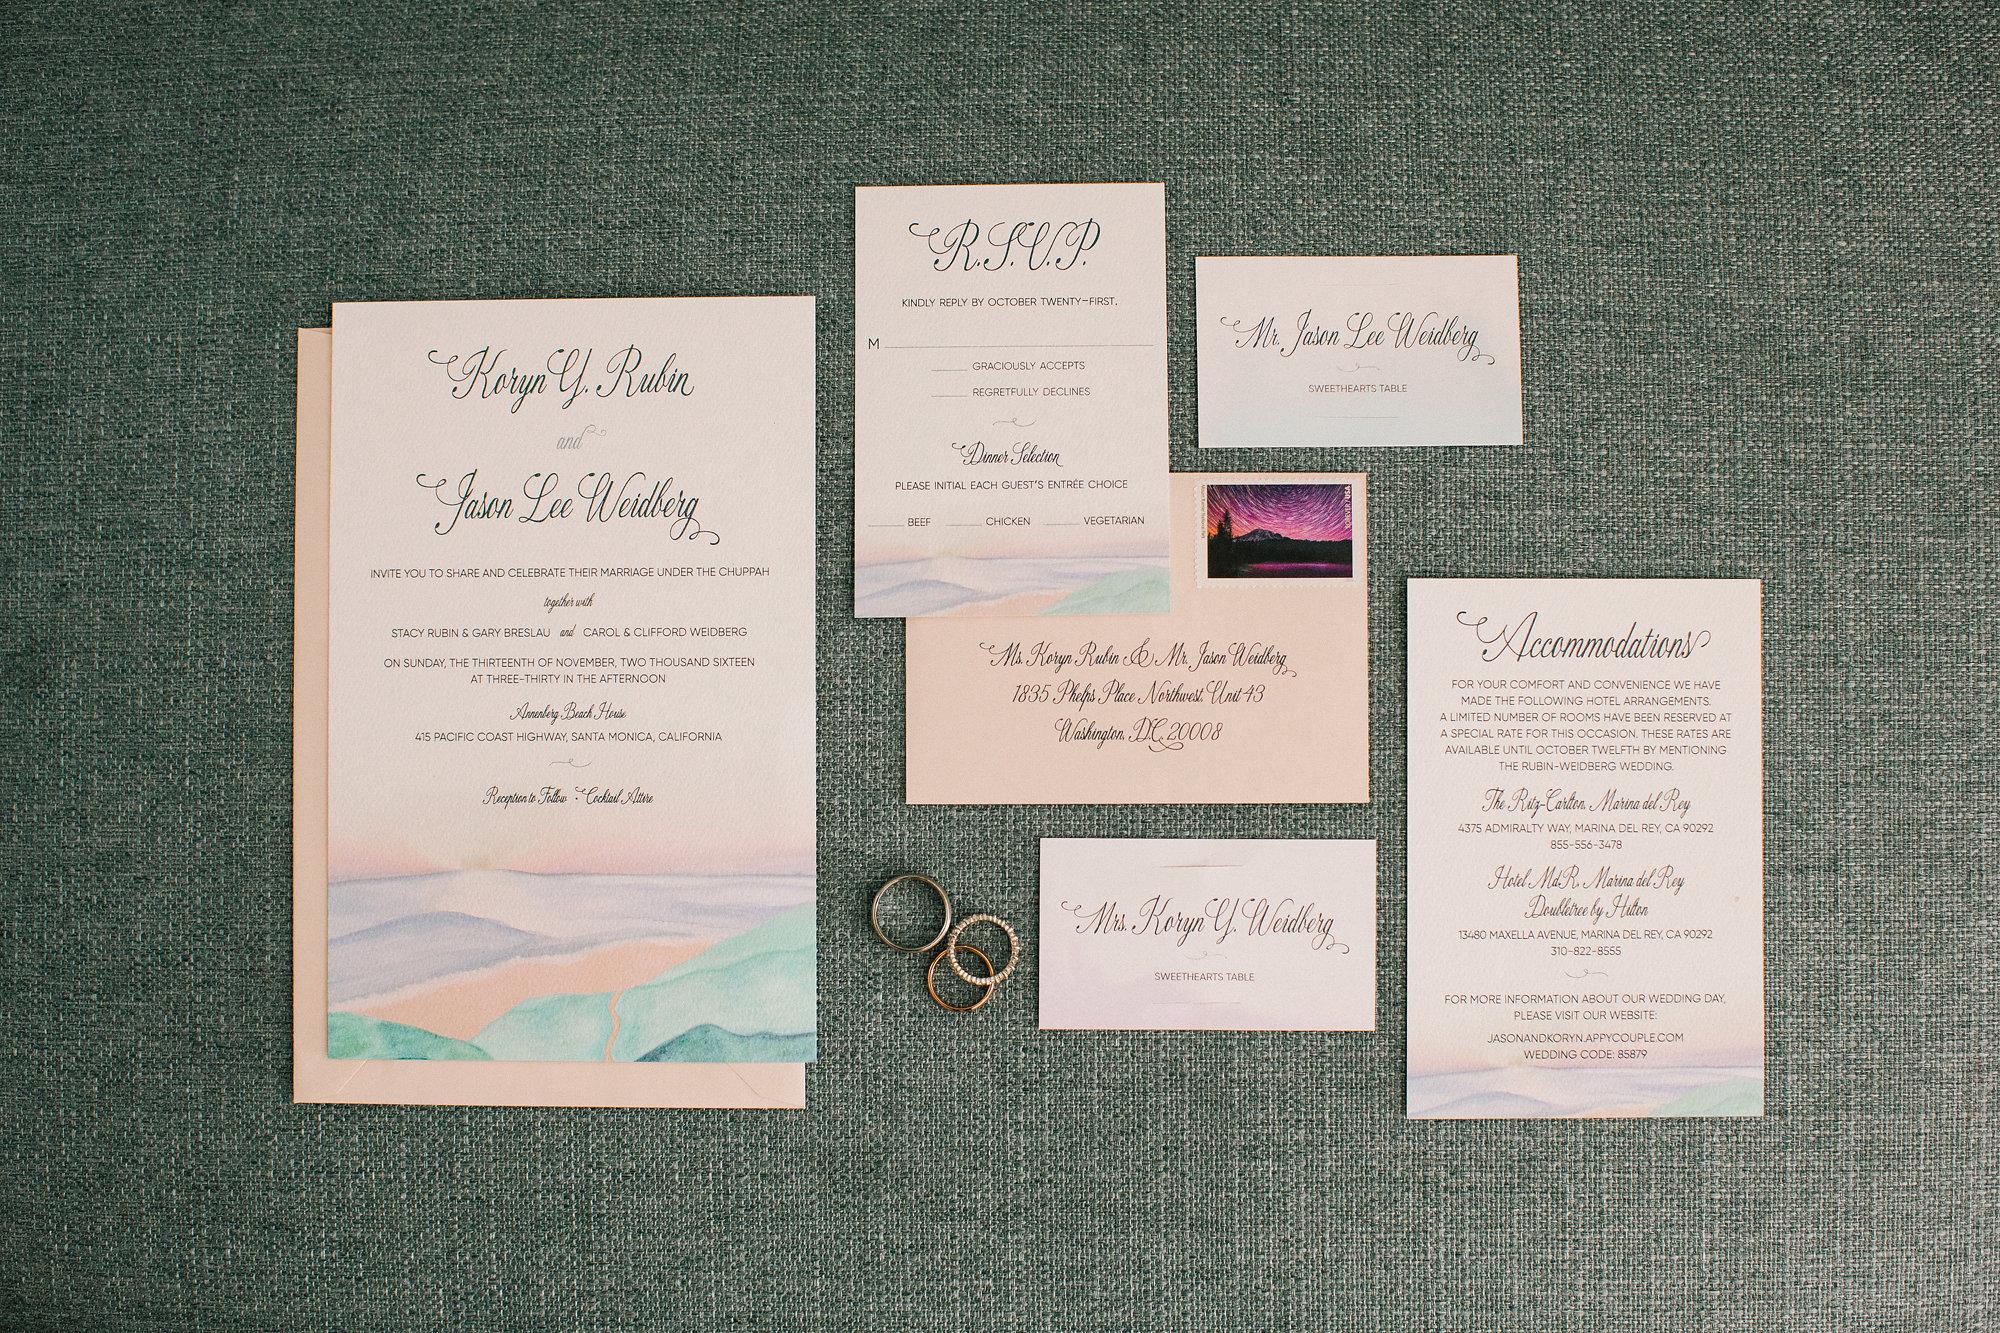 Type-A-Invitations-California-Custom-Wedding-Invitation-Koryn-Jason.jpg